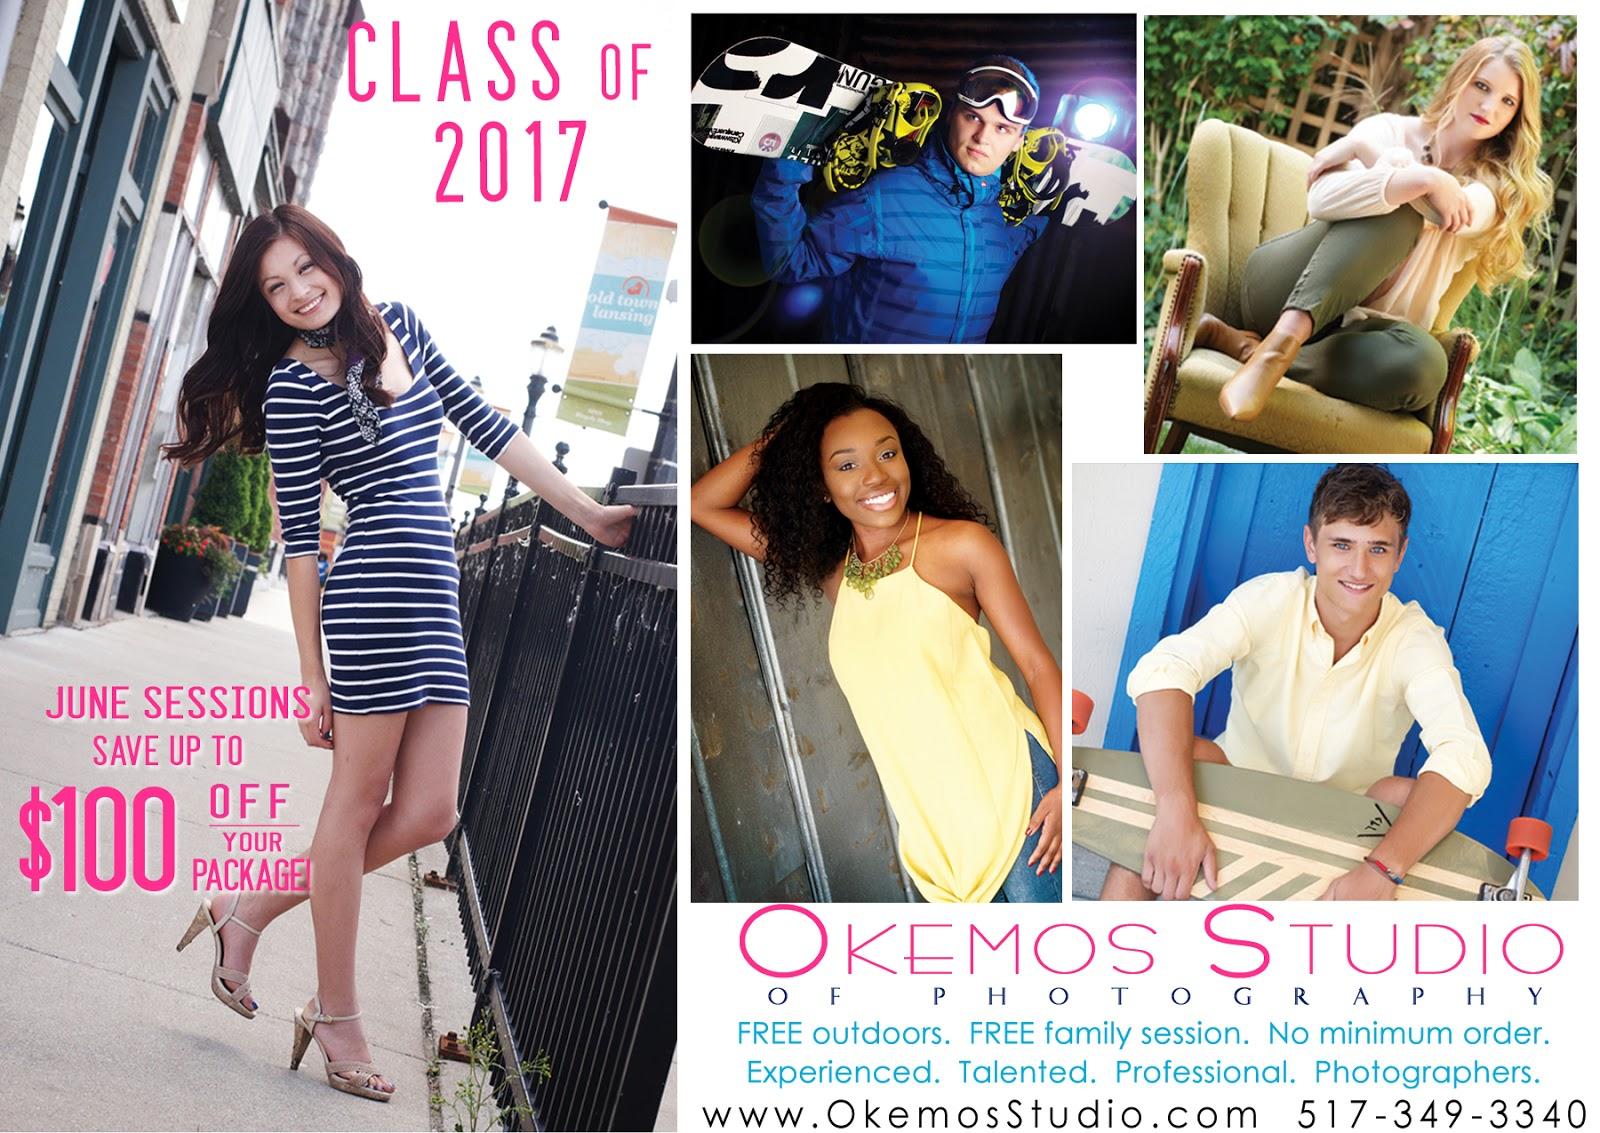 Okemos Studio of Photography